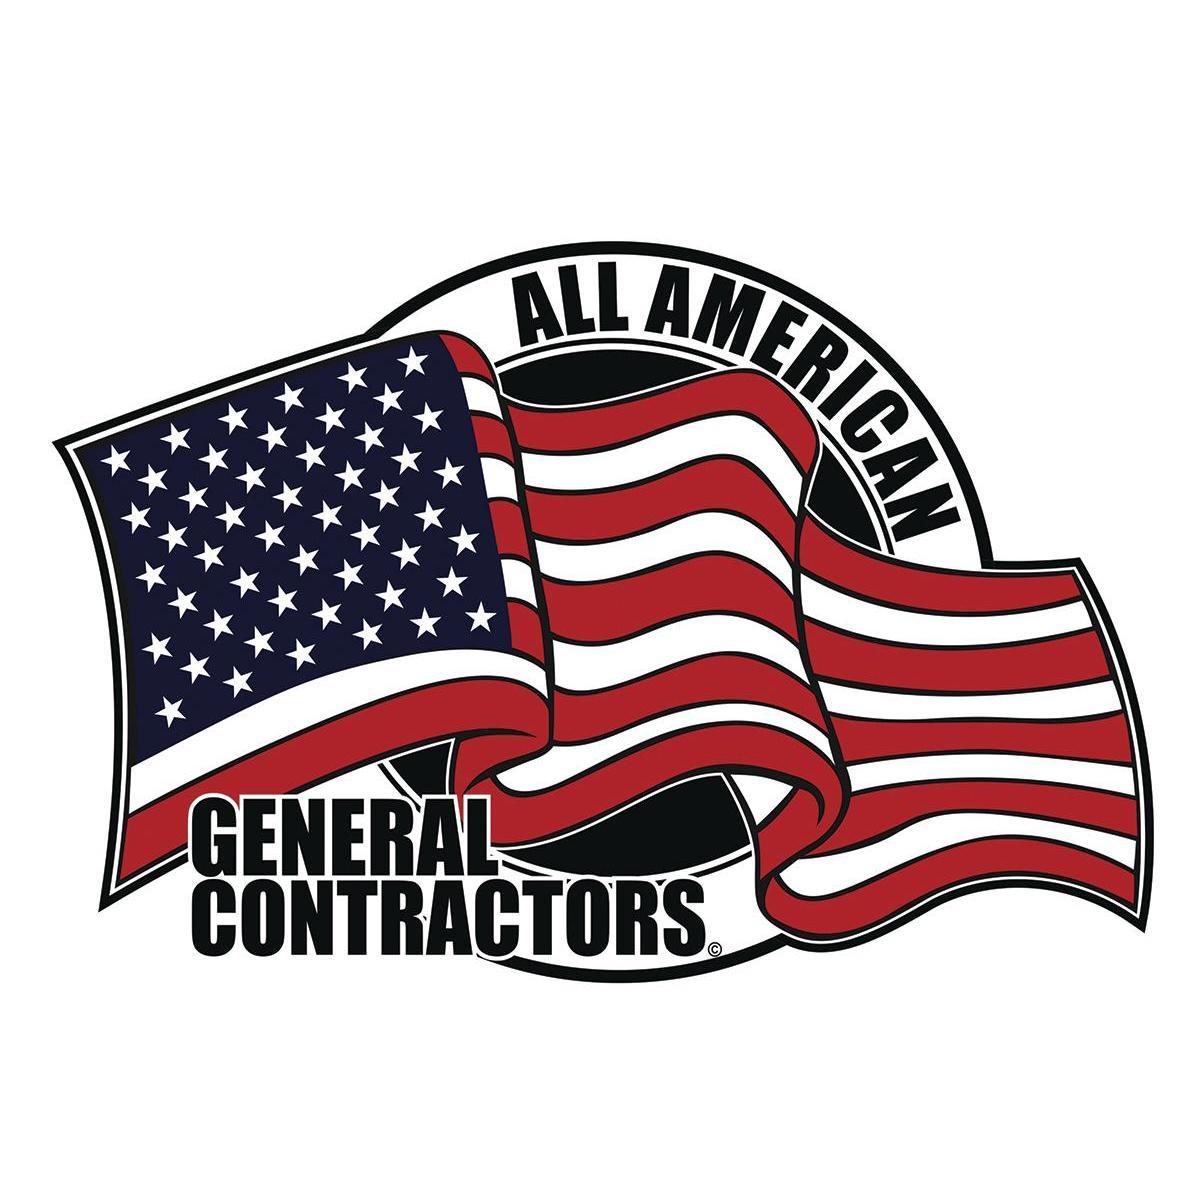 All American General Contractors